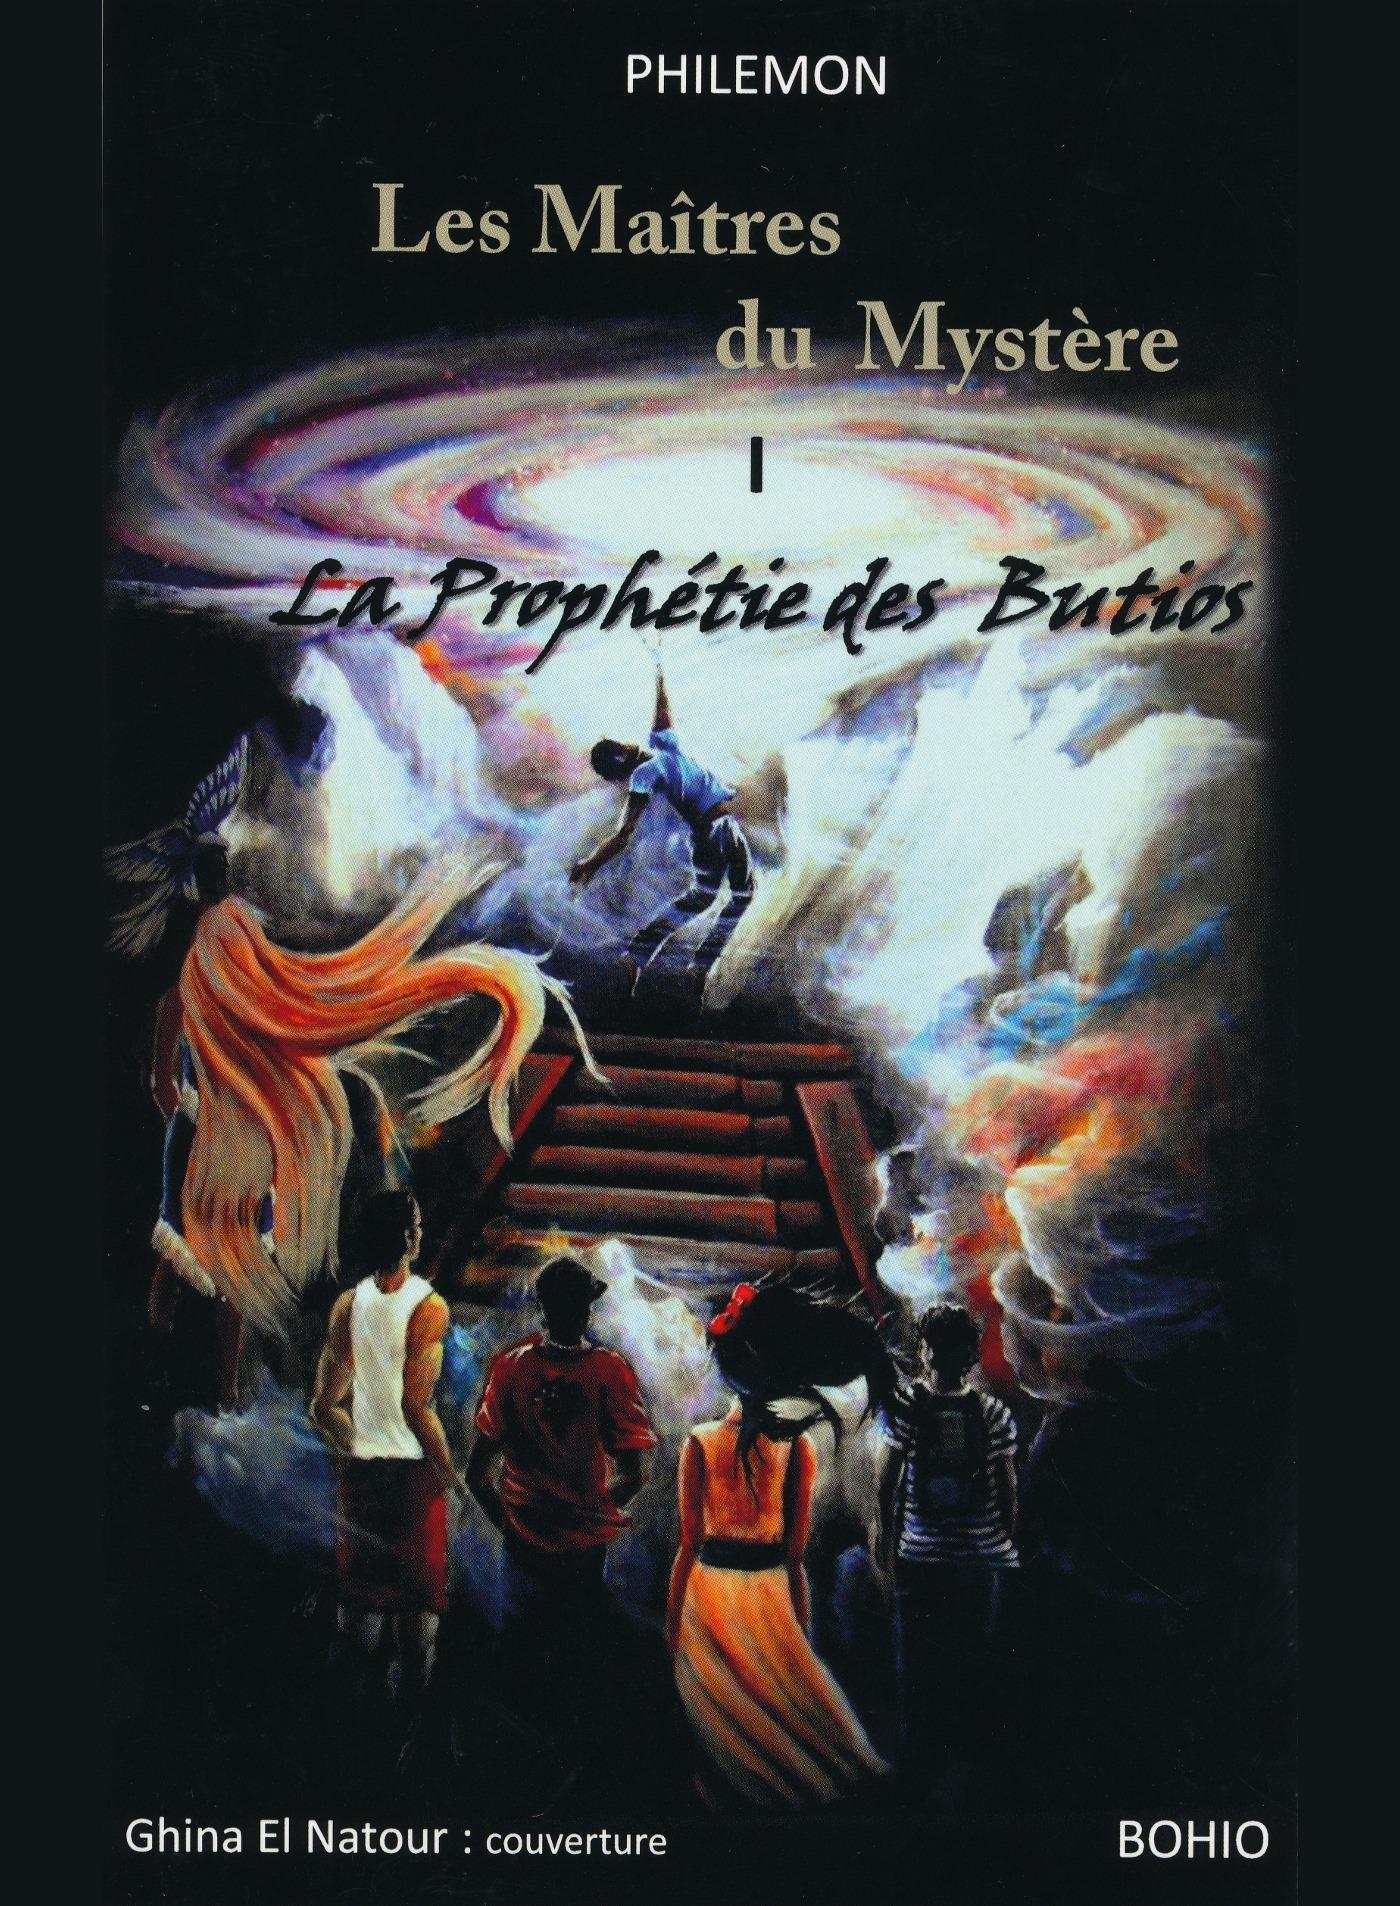 La prophétie des Butios